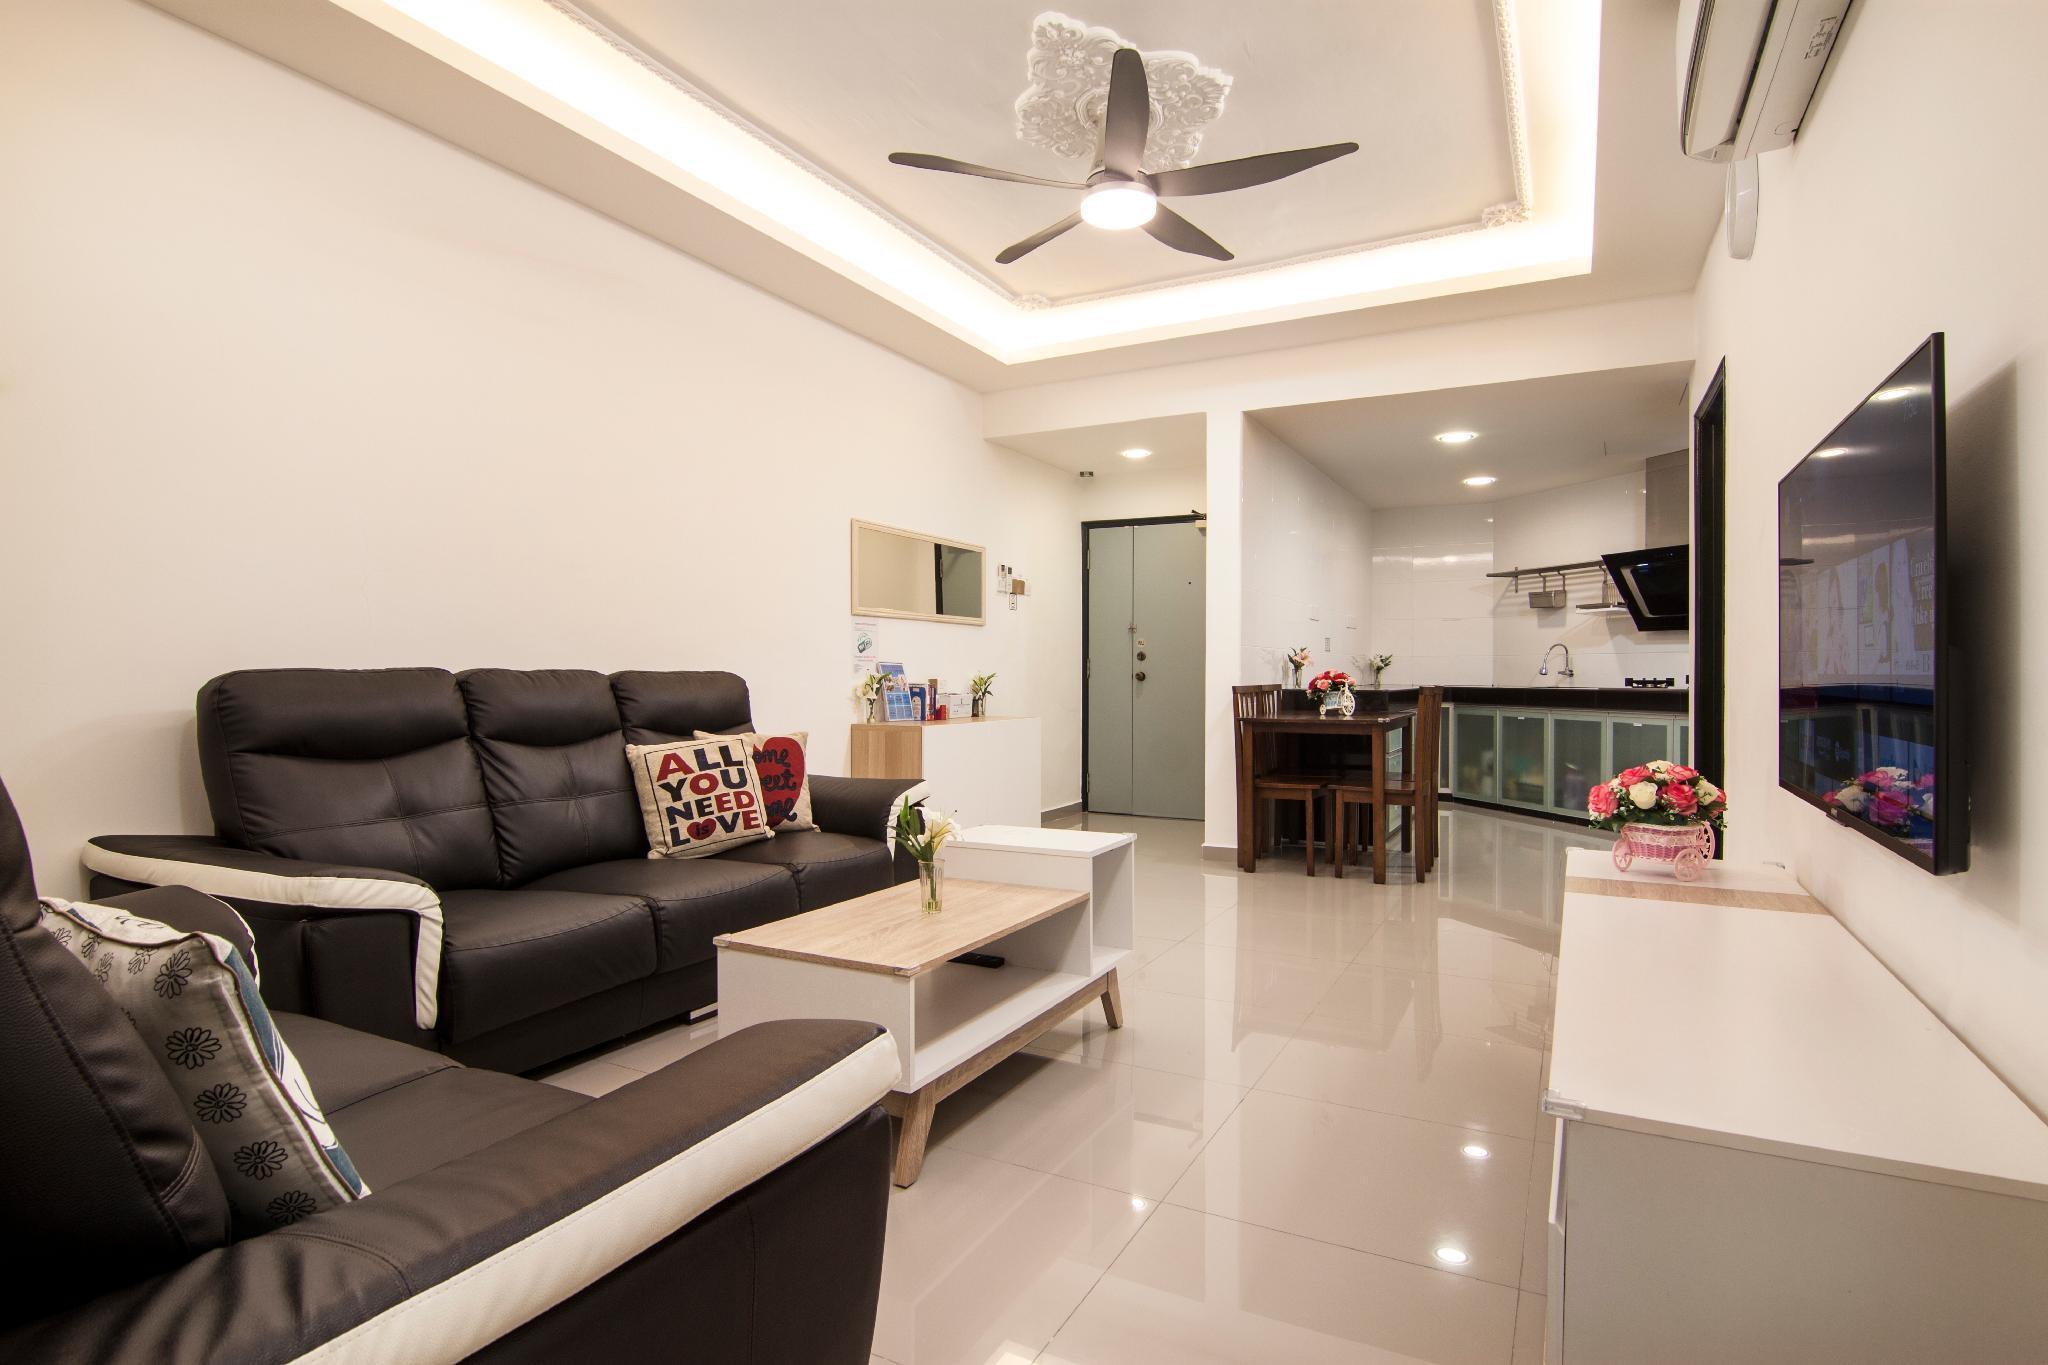 PWTC LRT - 5 Bedrooms Apartment, Kuala Lumpur - 5 Star Hotel